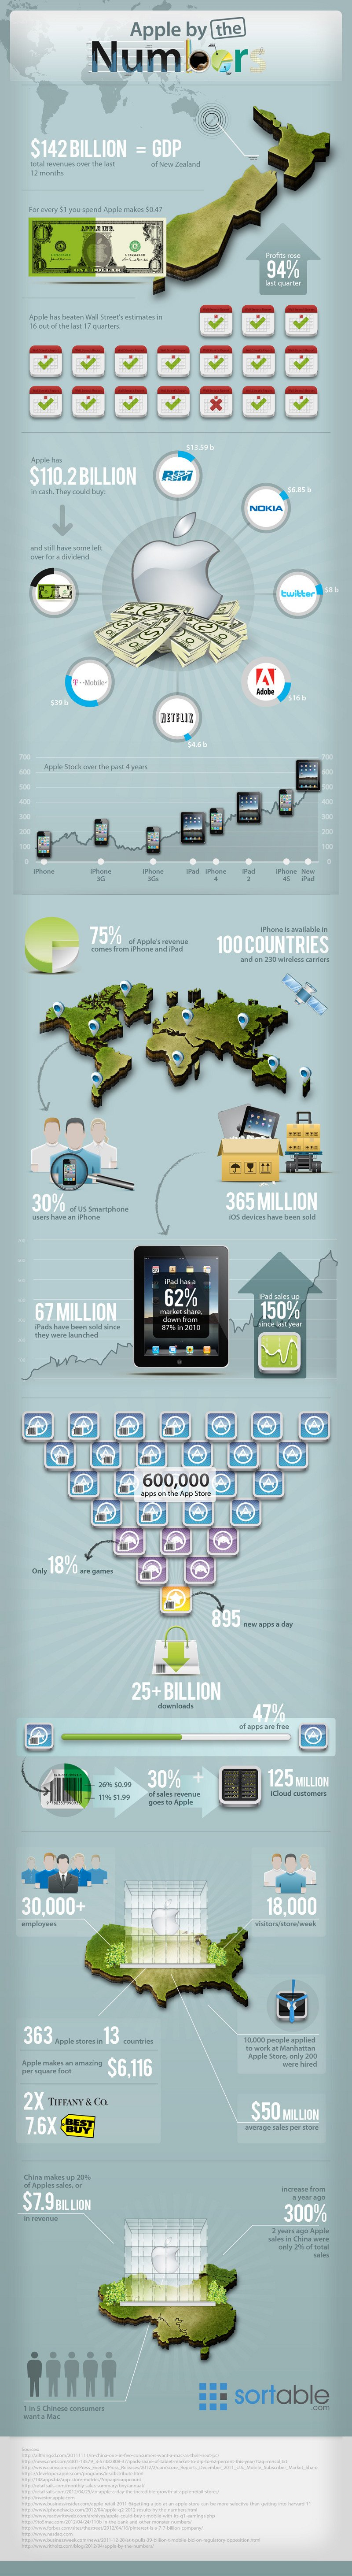 Apple in Zahlen